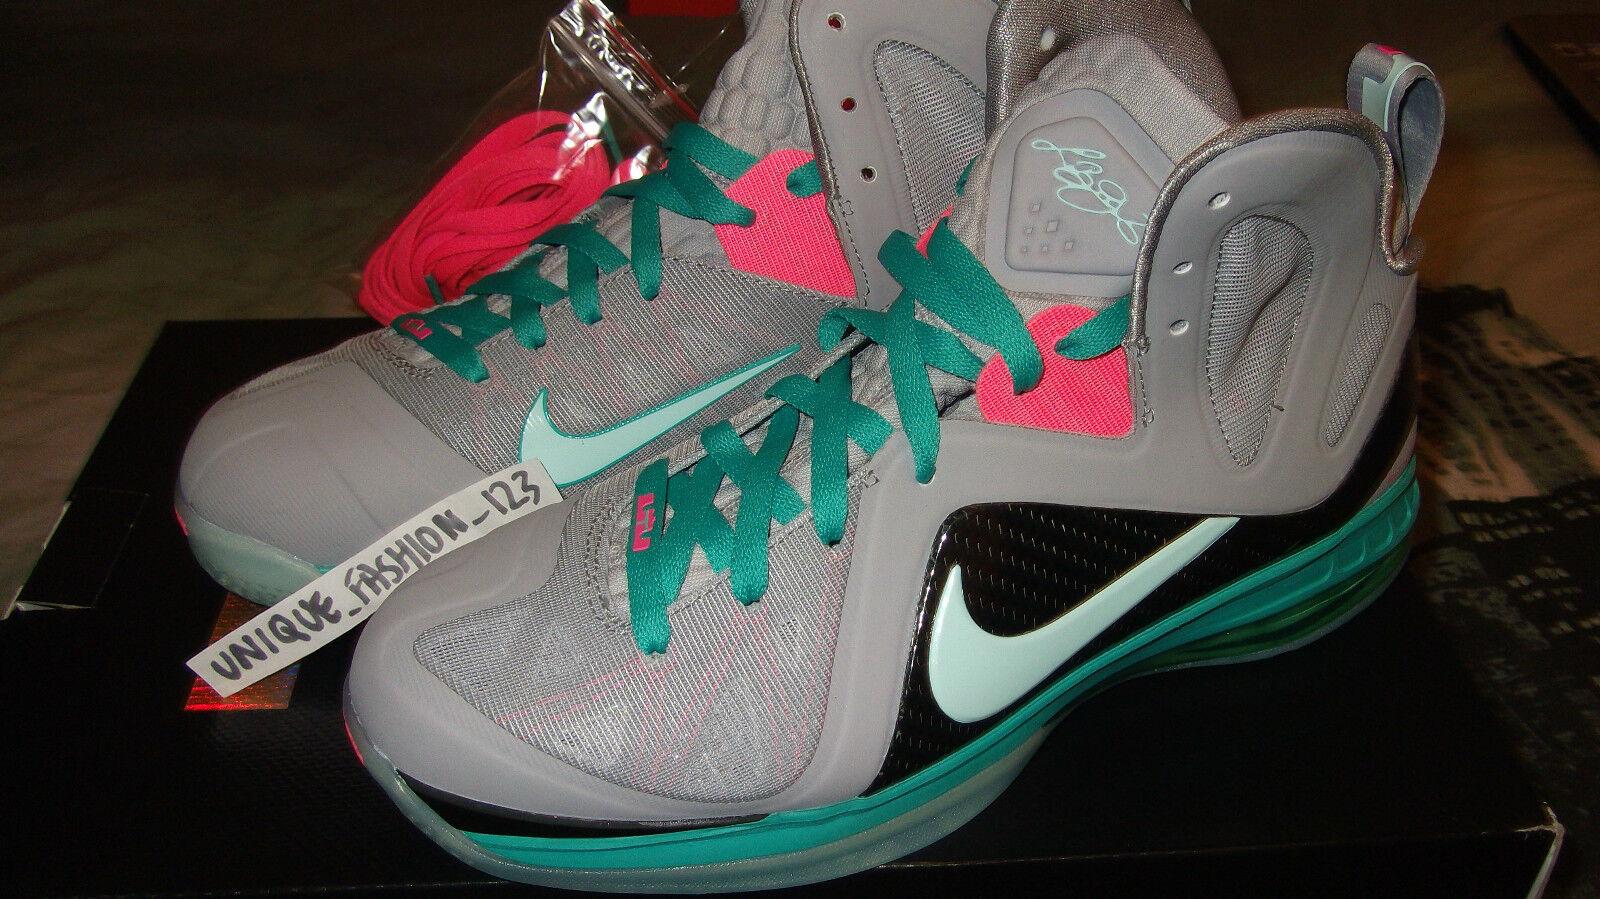 6a0c8a02fc2 Buy Nike Lebron 9 IX PS Elite South Beach Pre Heat US 11 UK 10 EU 45 ...